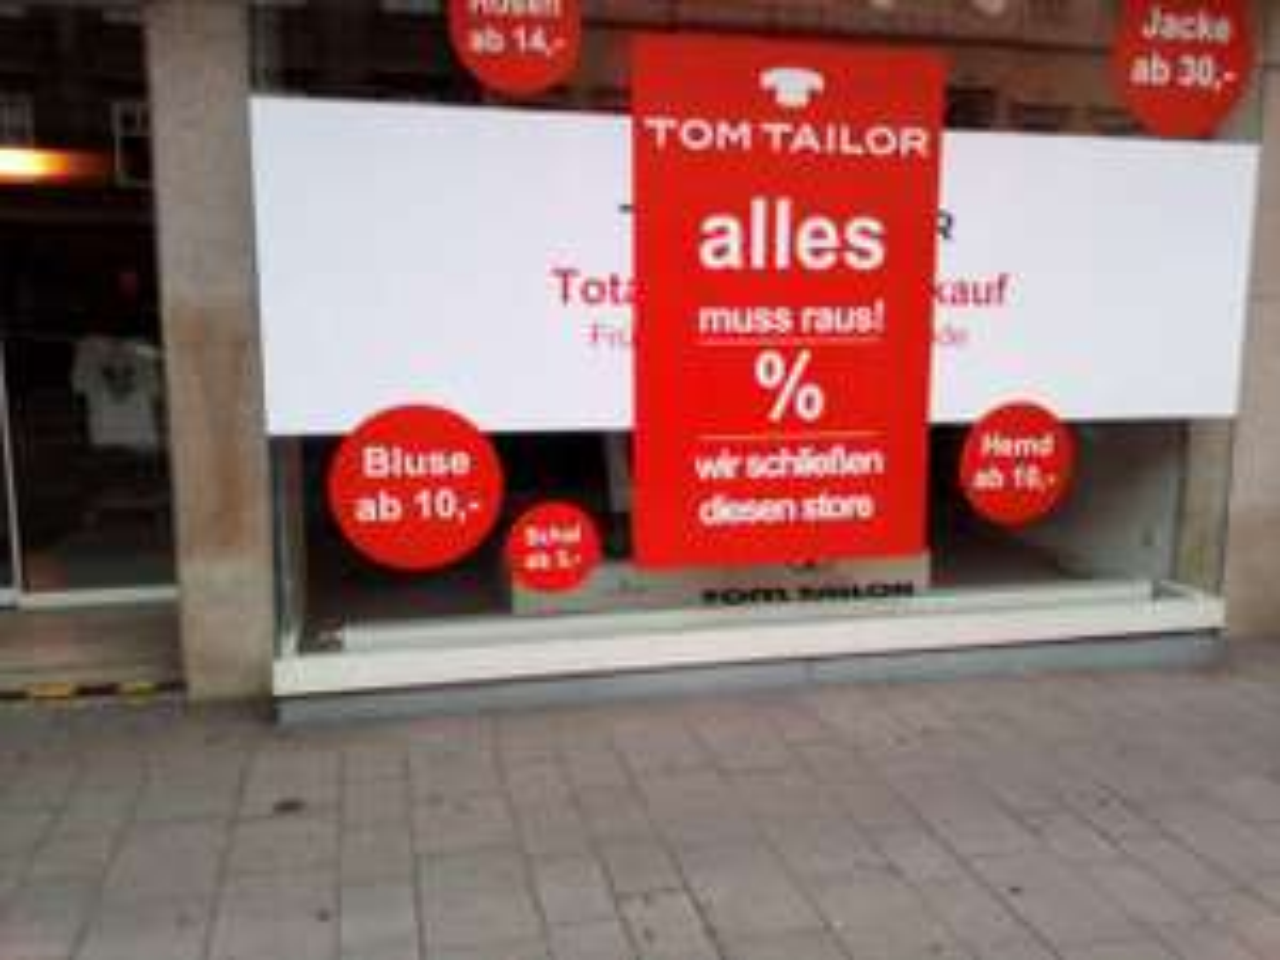 [Tom Tailor] TOM TAILOR Räumungsverkauf Landstraßer Hauptstraße 65 1030 Wien schließt